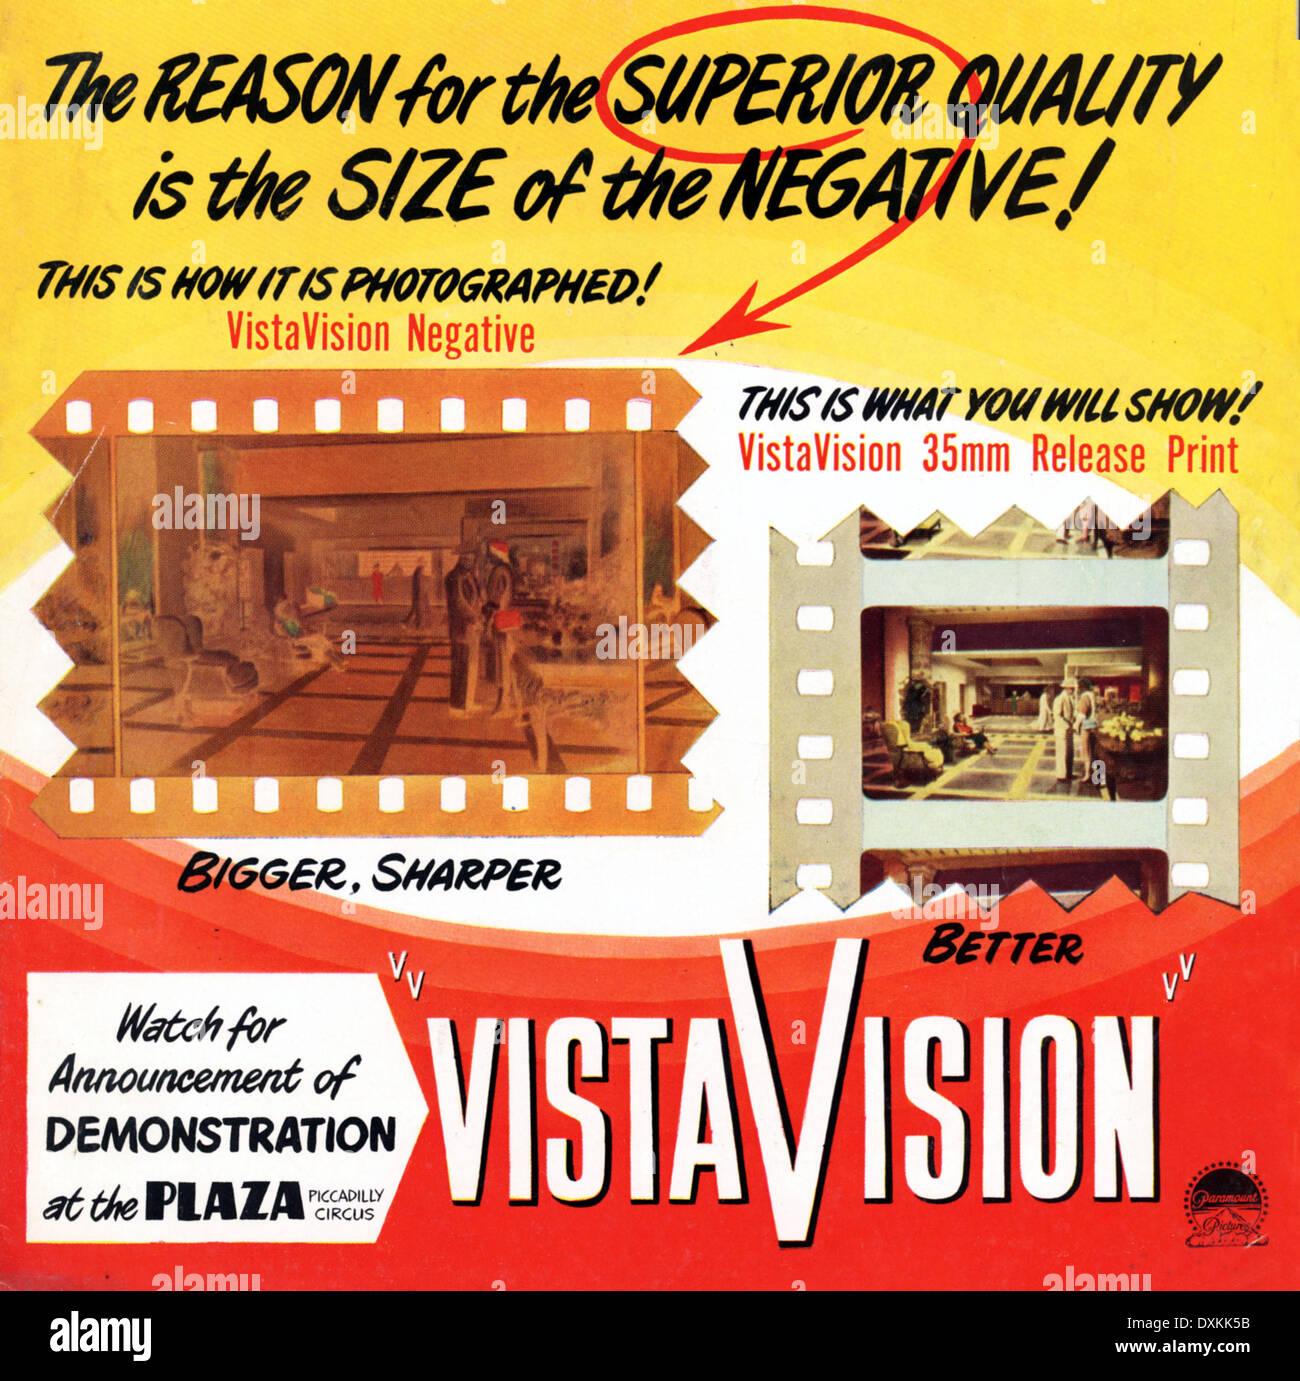 VISTAVISION ADVERTISEMENT - Stock Image